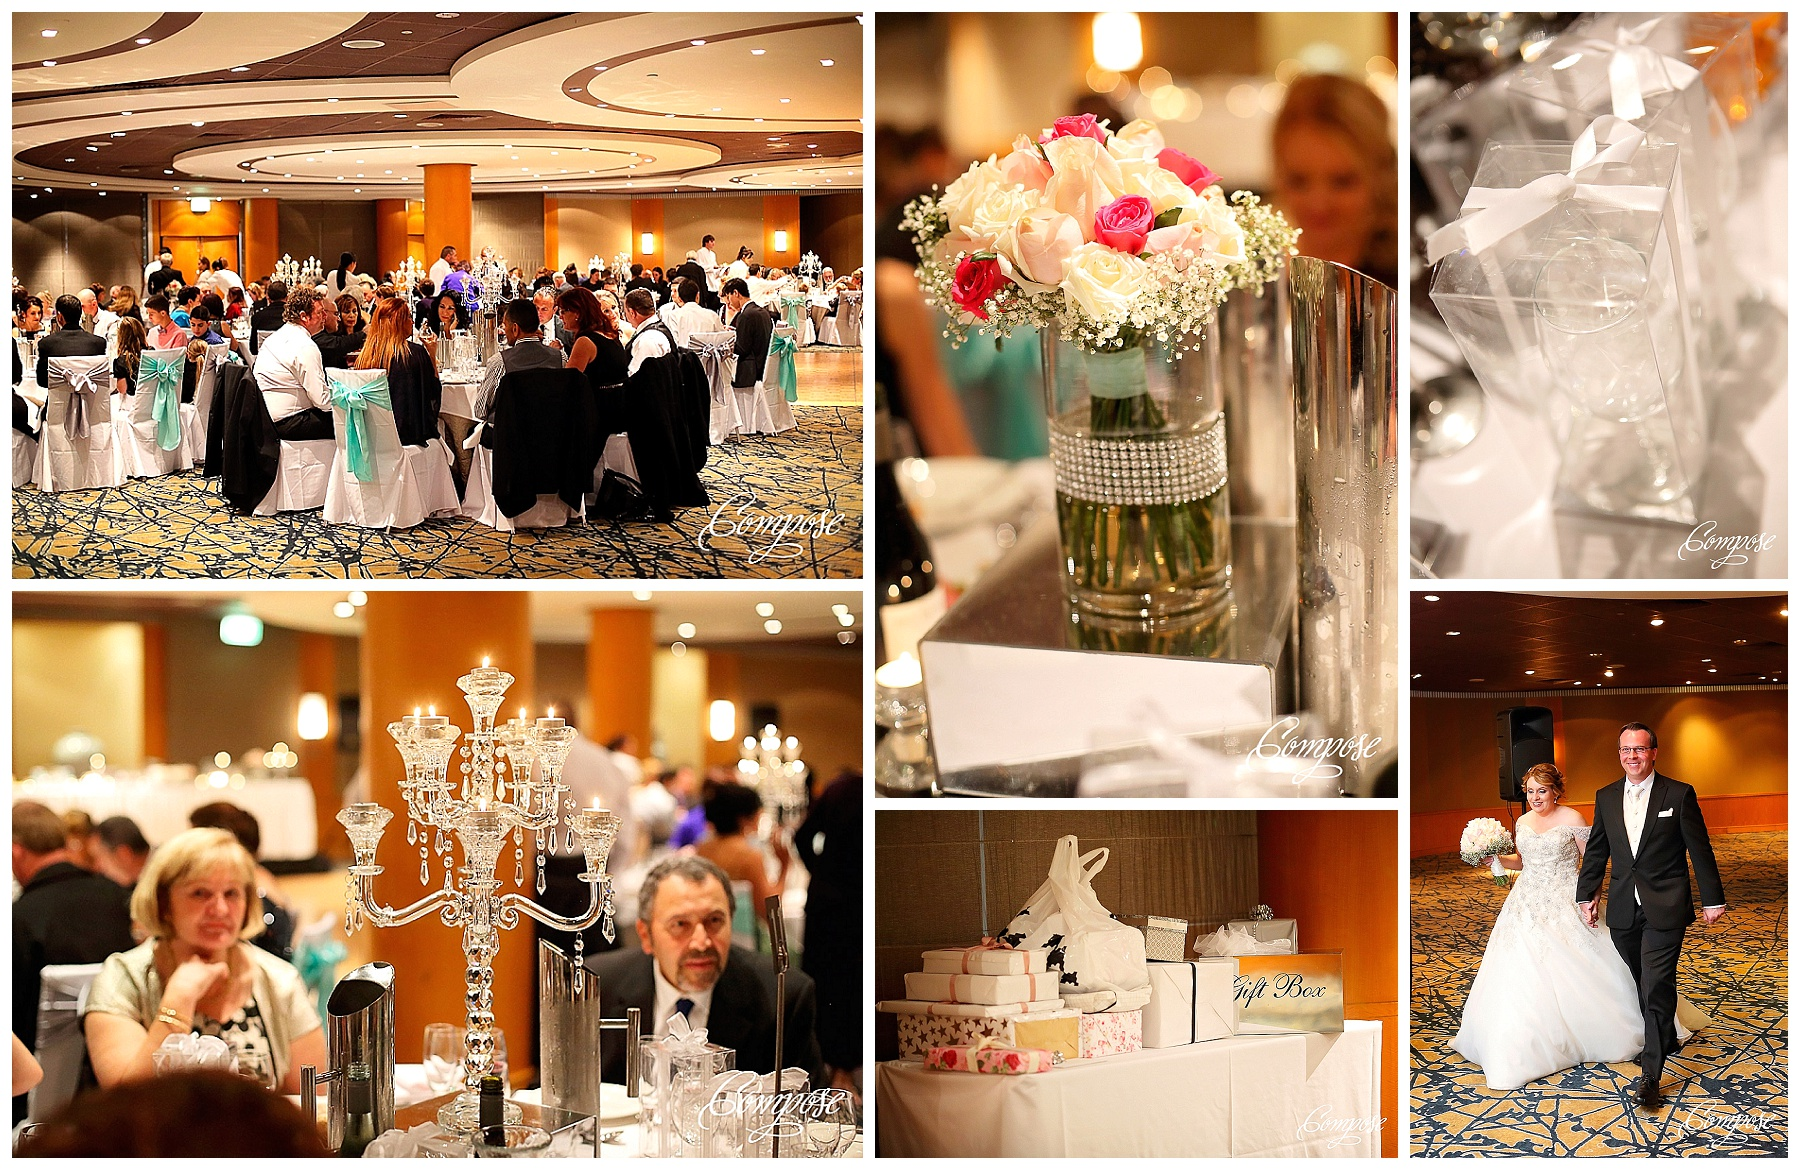 Hyatt wedding Terrace ballroom